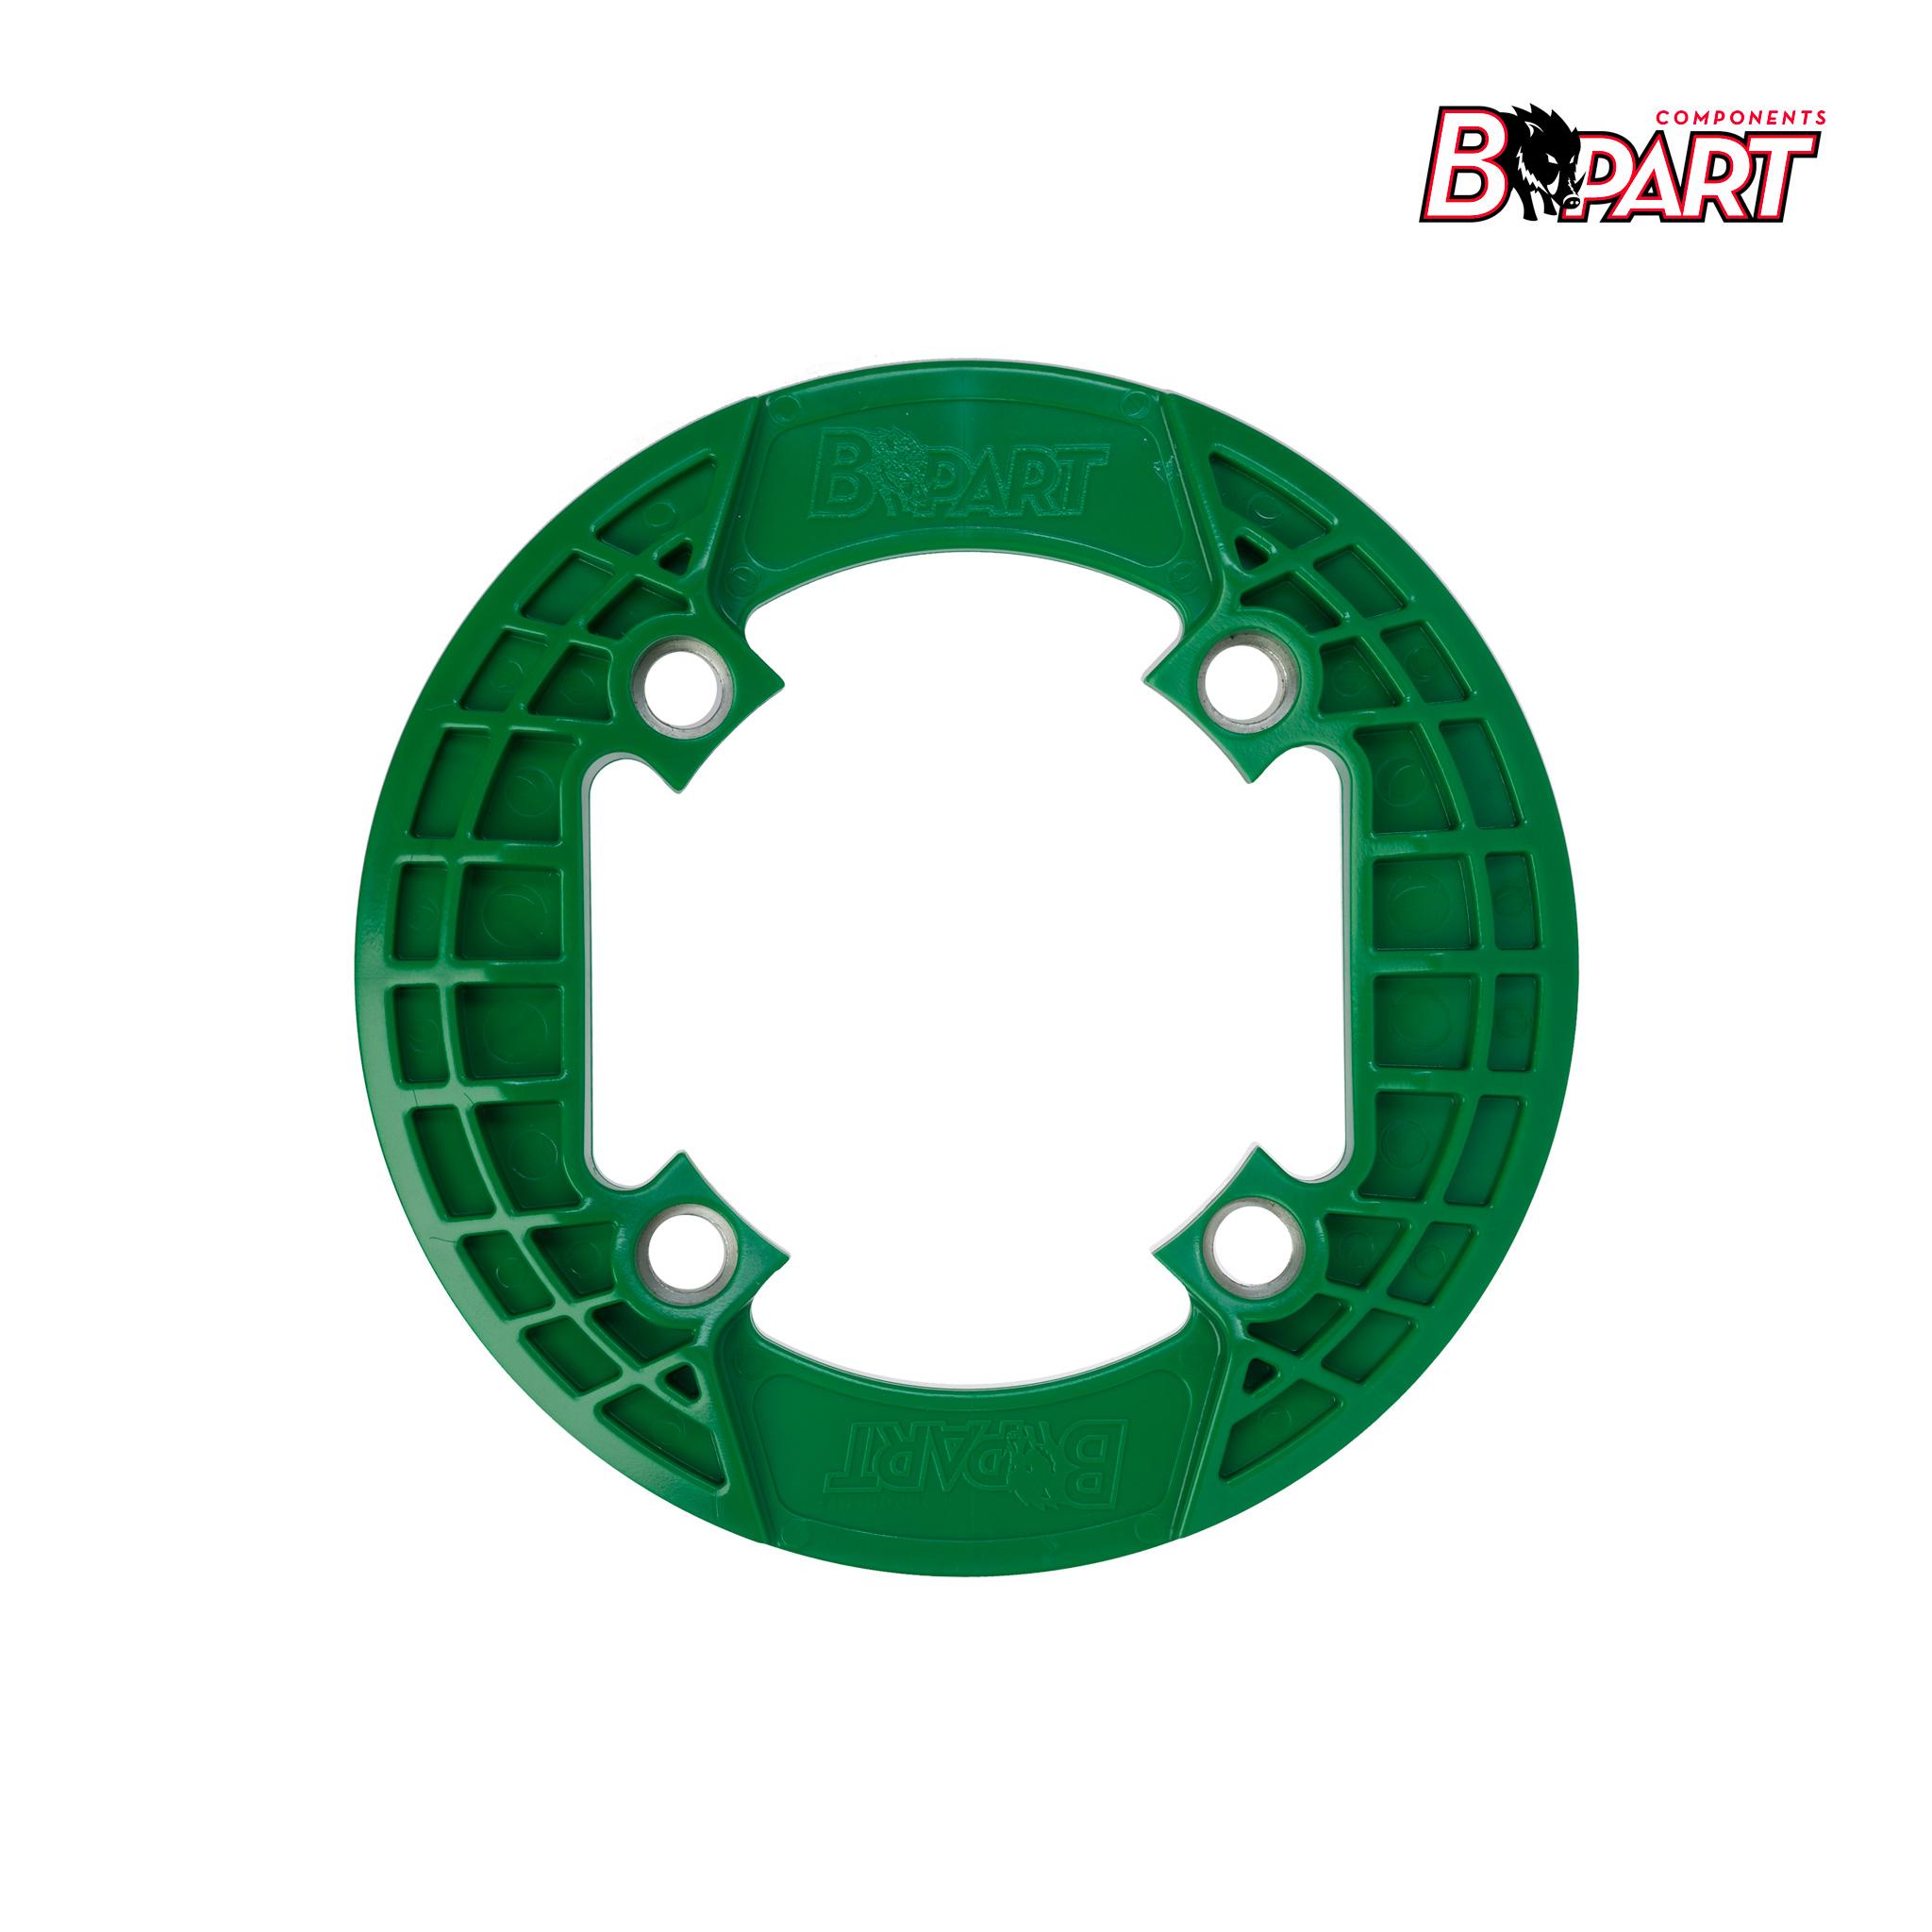 Bpart Components cubreplatos verde oscuro